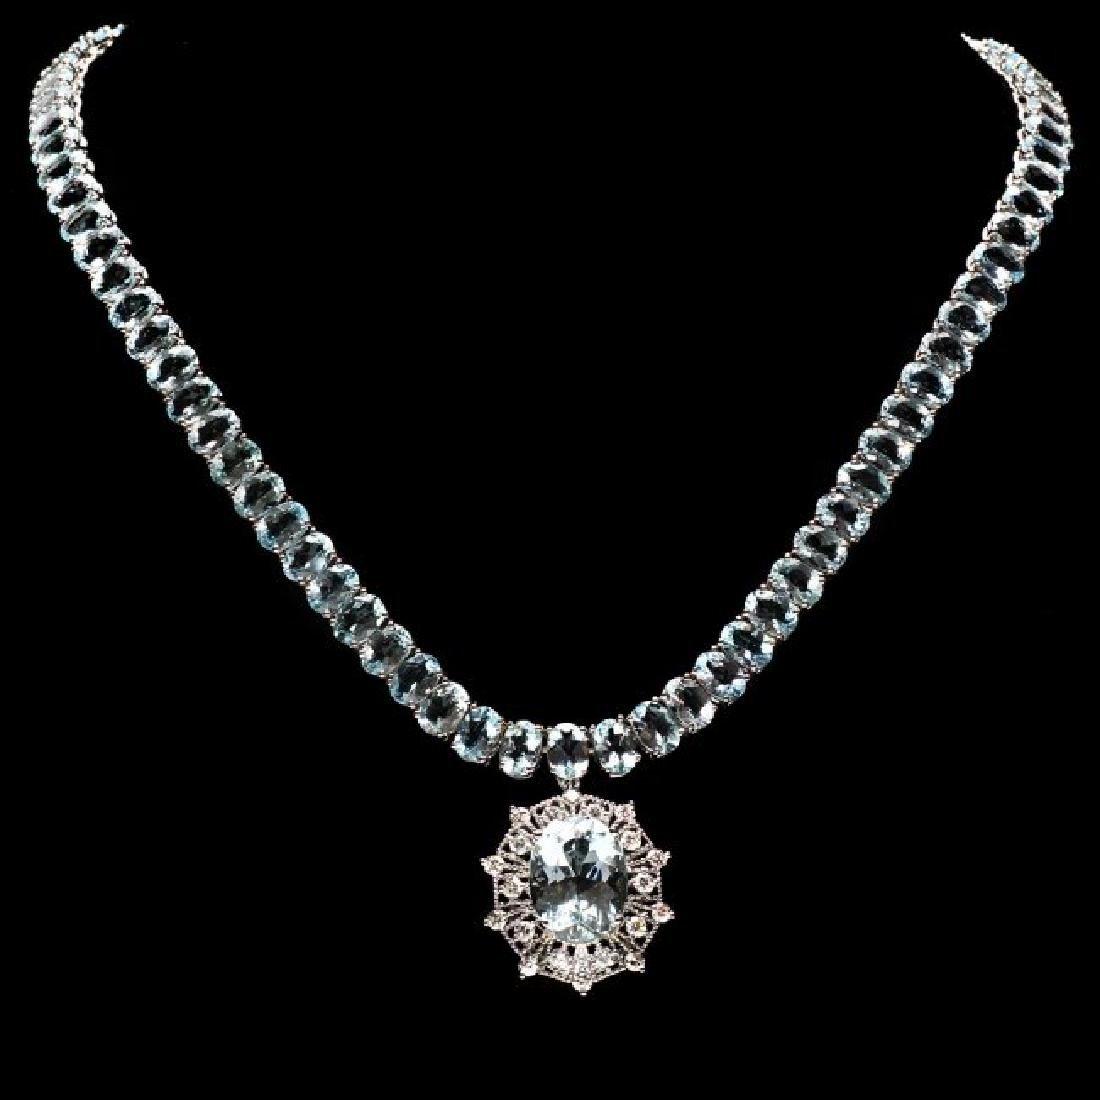 14k Gold 61ct Aquamarine 1.35ct Diamond Necklace